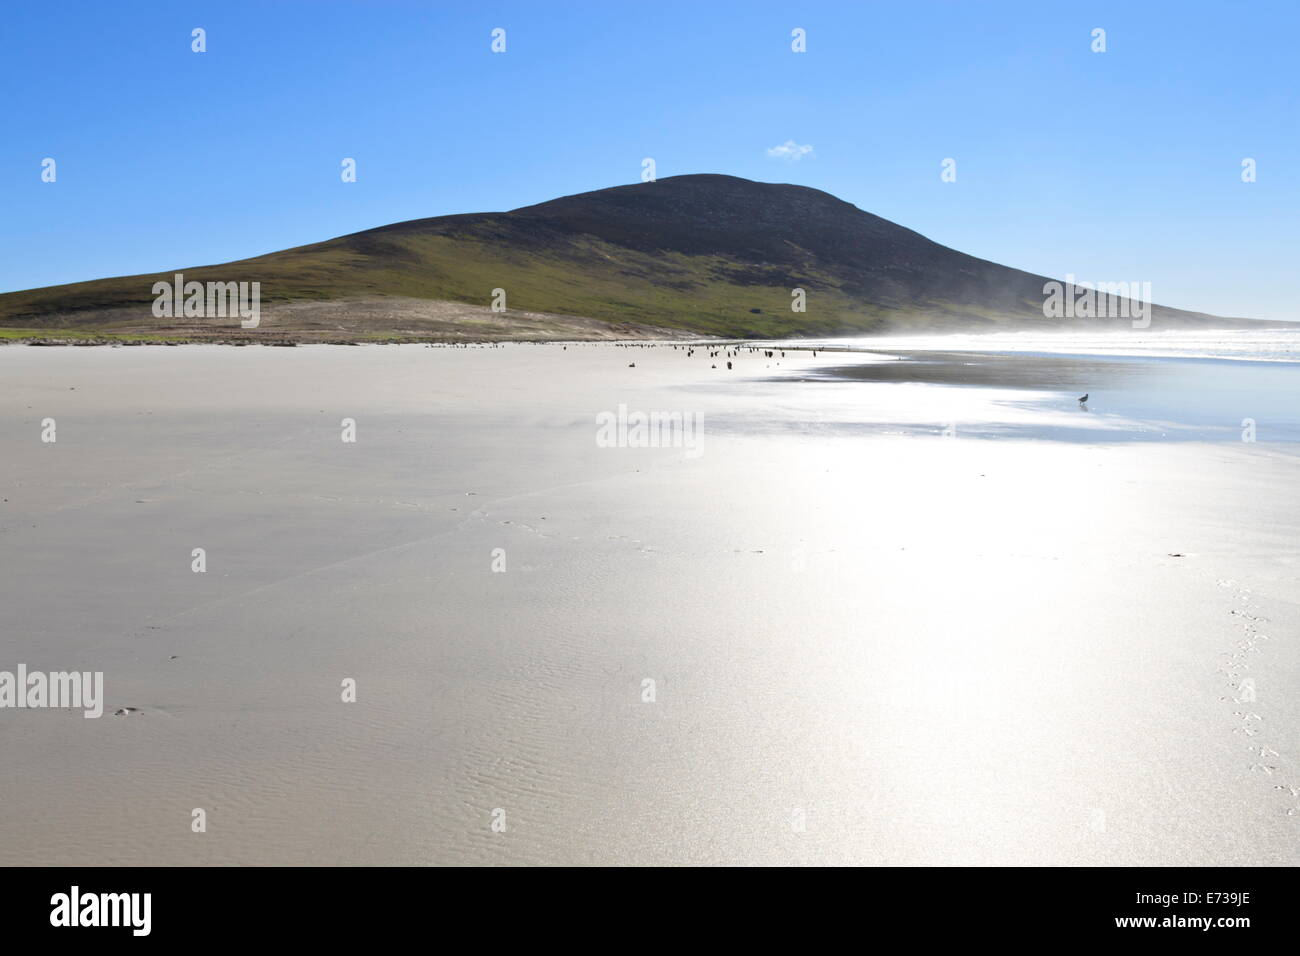 Glistening beach, tracks, sea spray and Mount Harston, the Neck, Saunders Island, Falkland Islands, South America - Stock Image